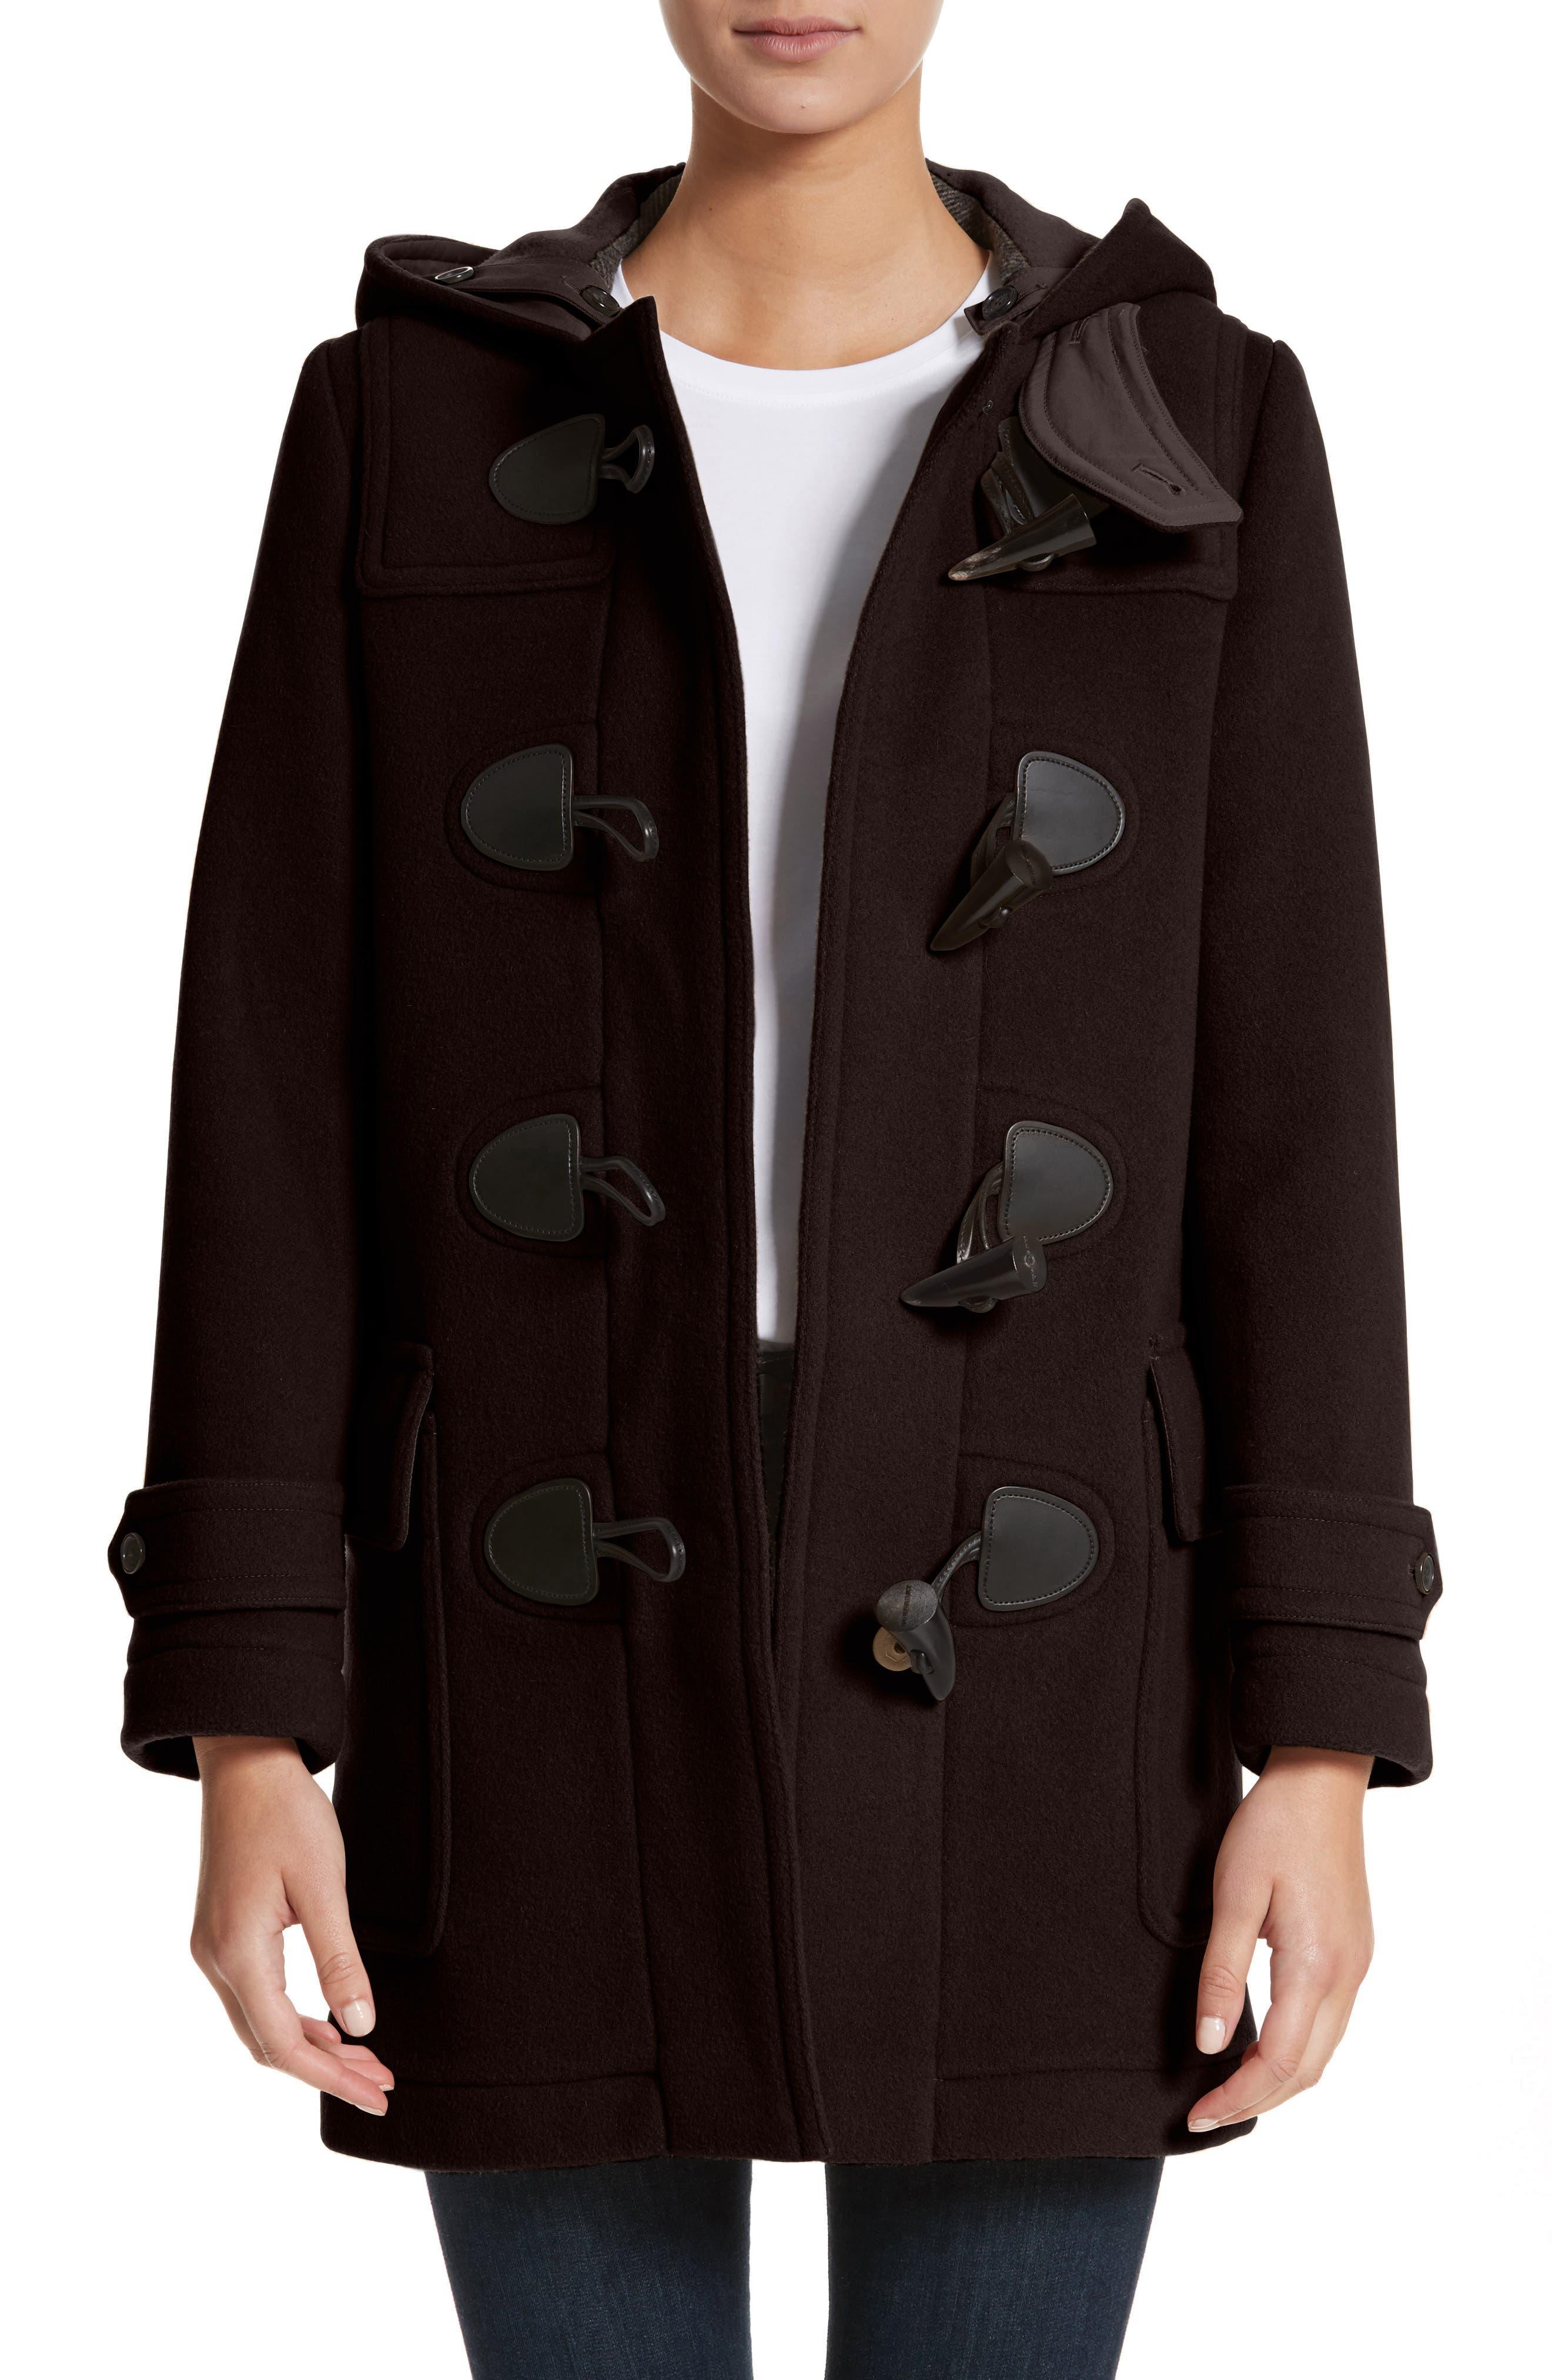 Mersey Wool Blend Duffle Coat,                         Main,                         color, 001